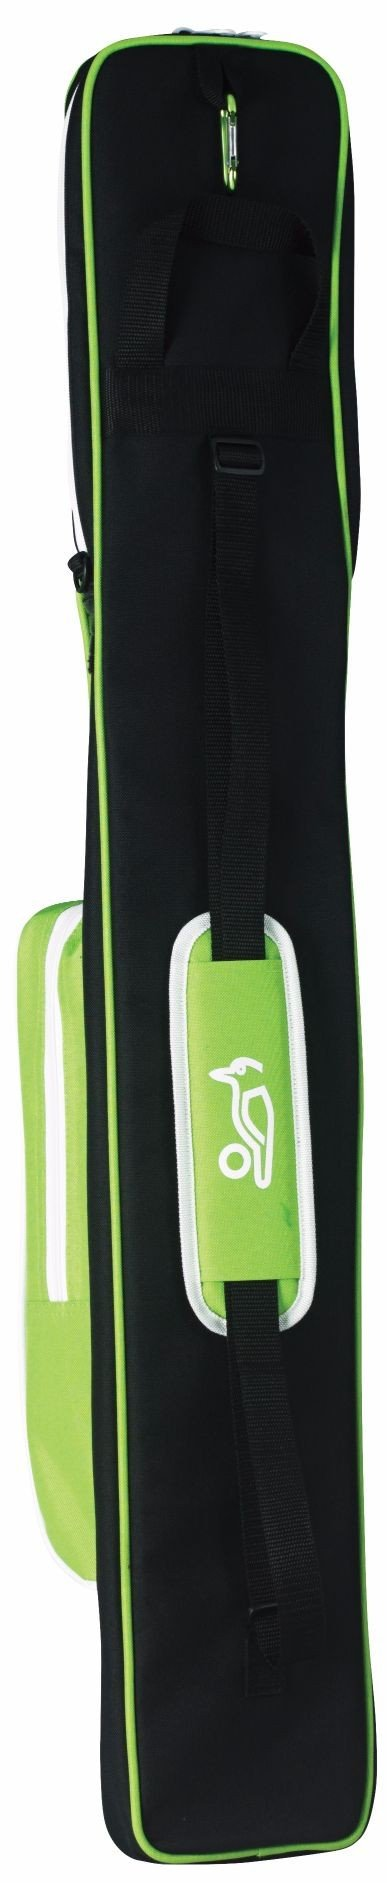 2016/17 Kookaburra Energy Hockey Bag